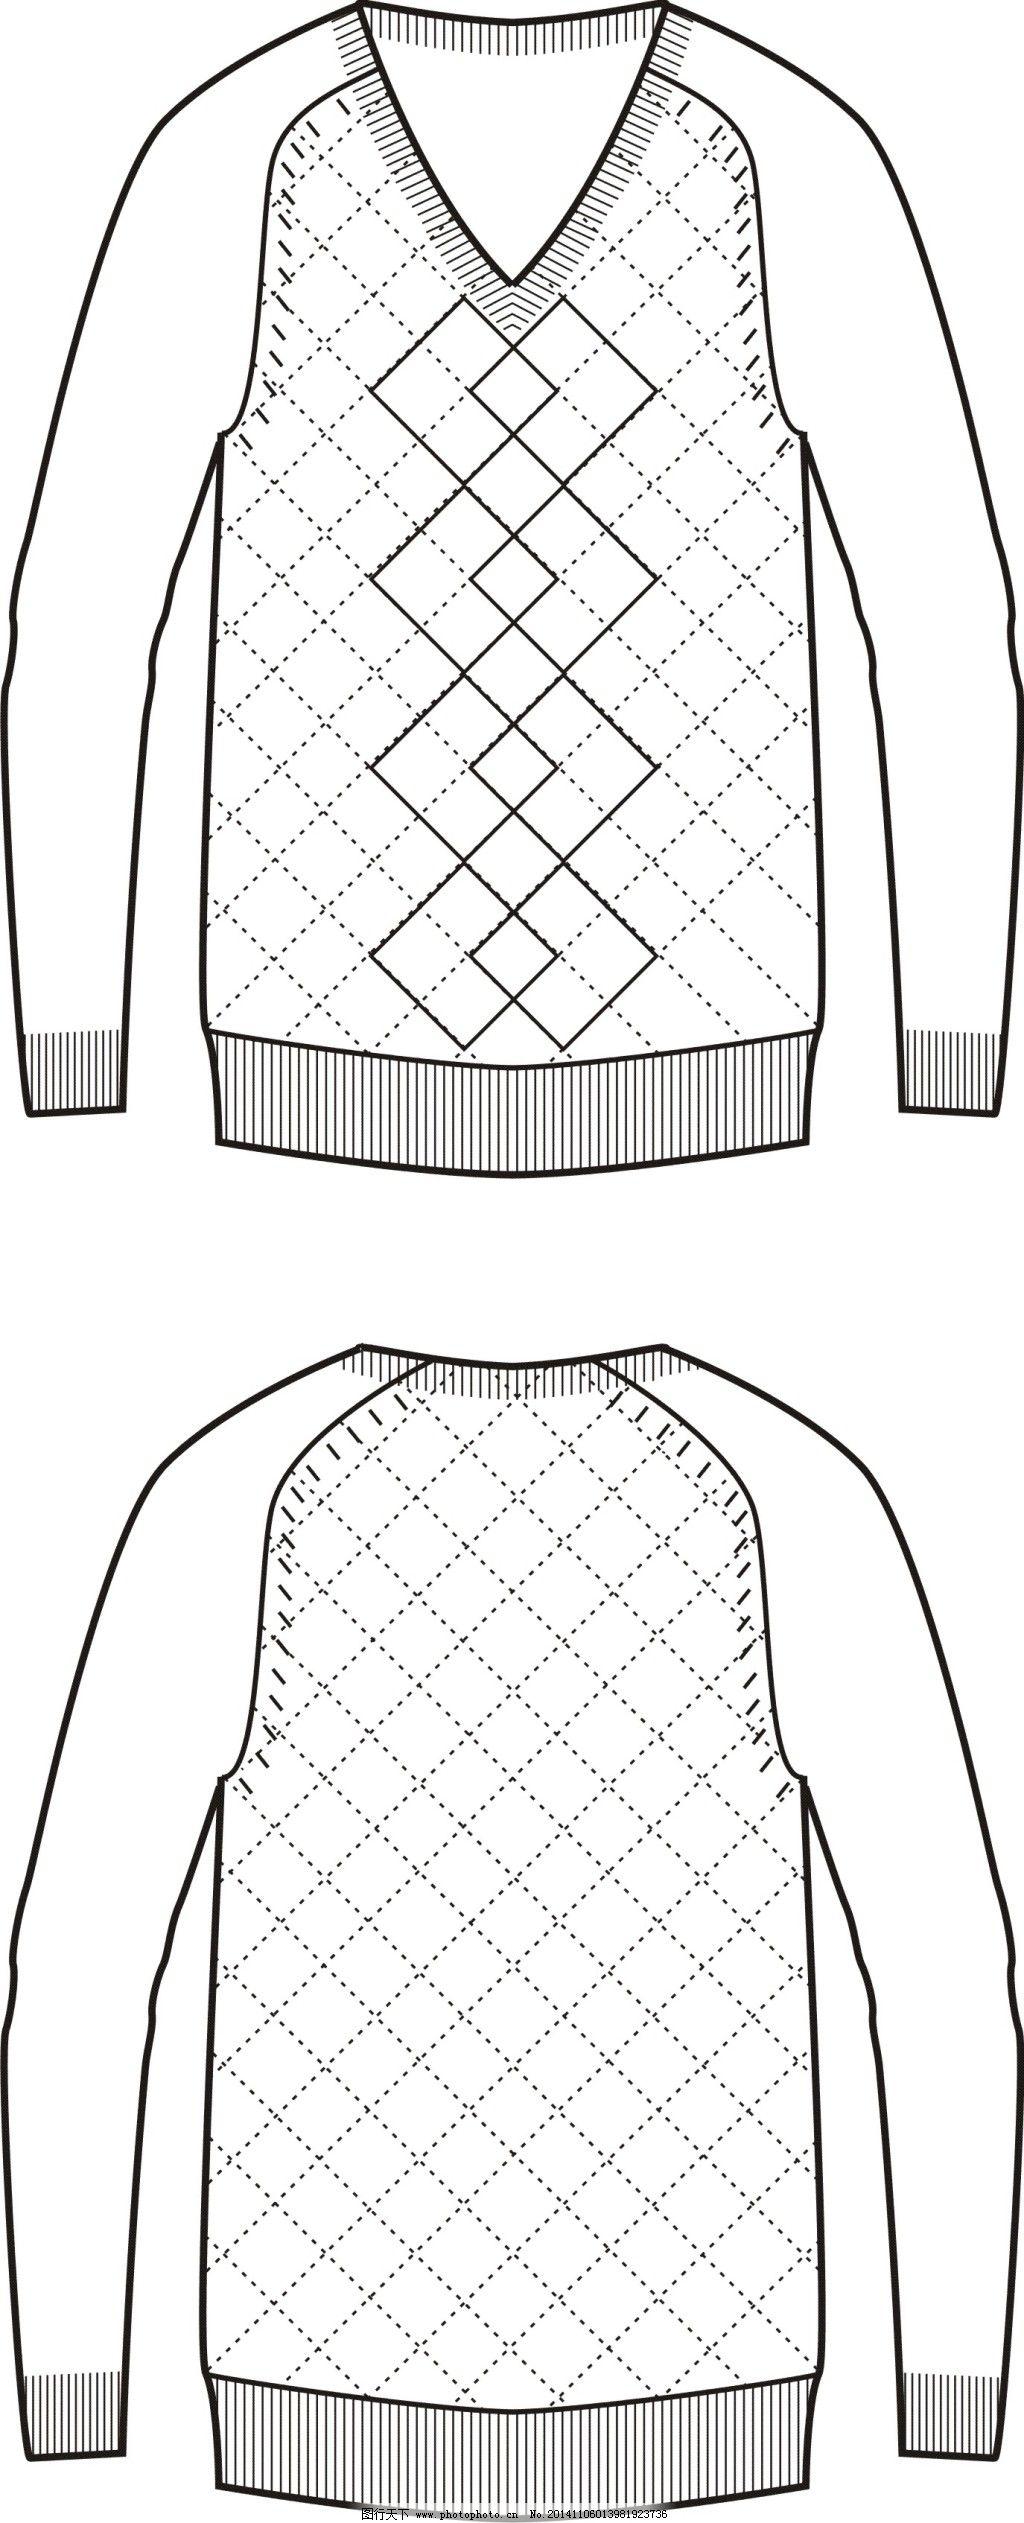 v领个性曲线插肩袖菱形图案针织衫